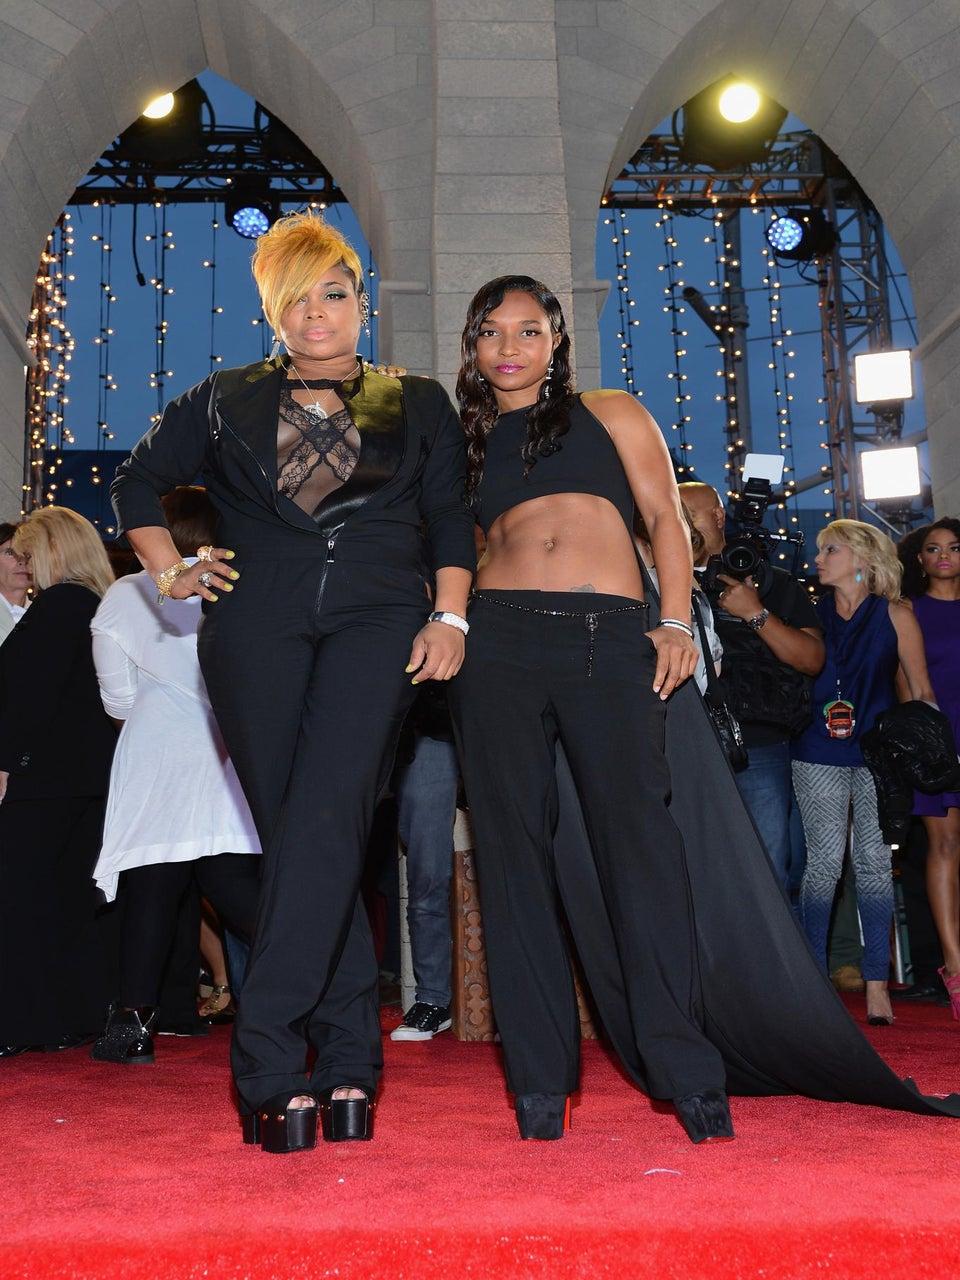 TLC Talks Sisterly Bond and Missing Left Eye